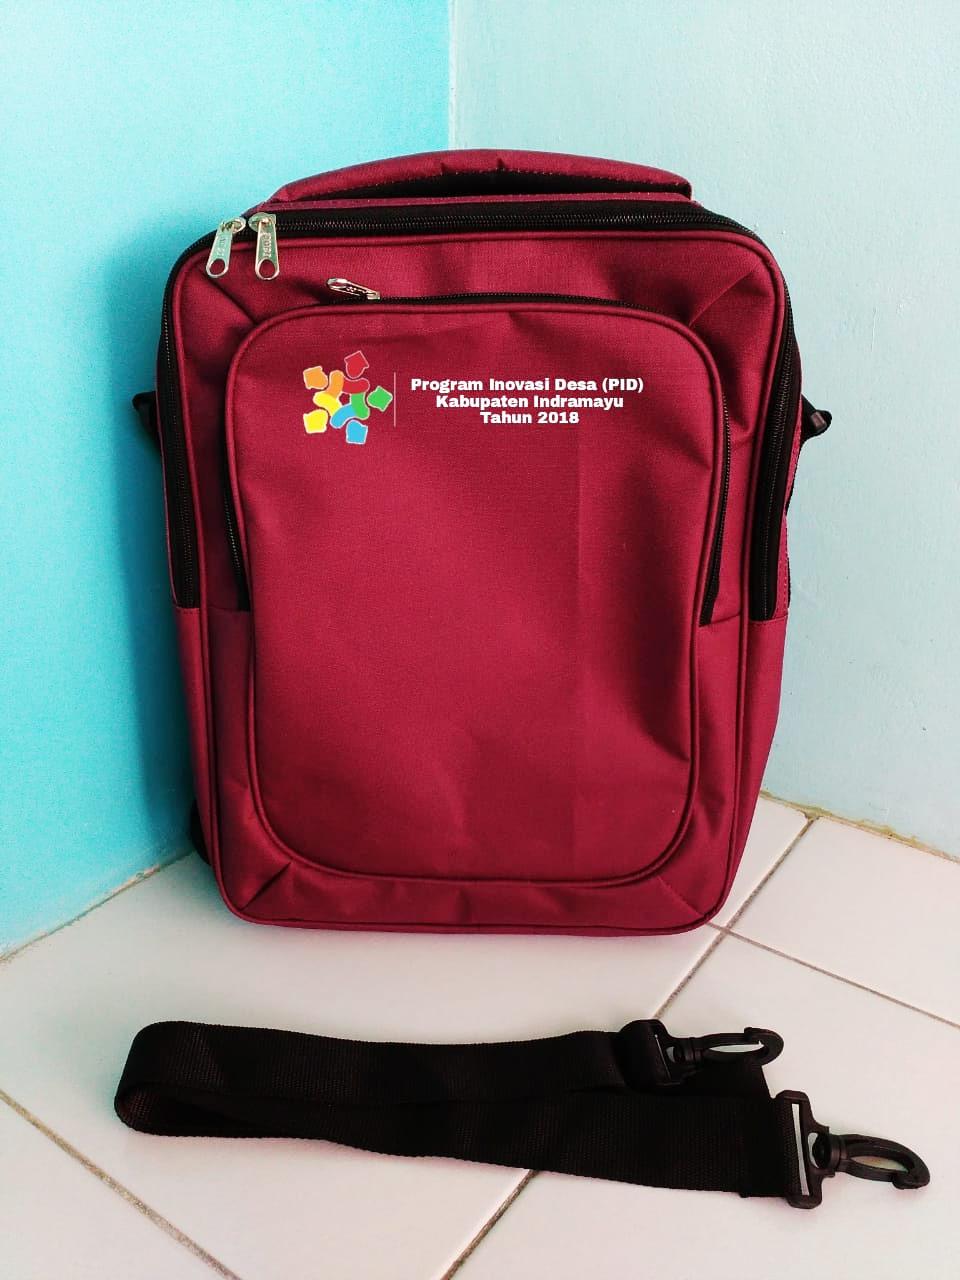 Tas Seminar Kabupaten Indramayu Tasrahmat.com